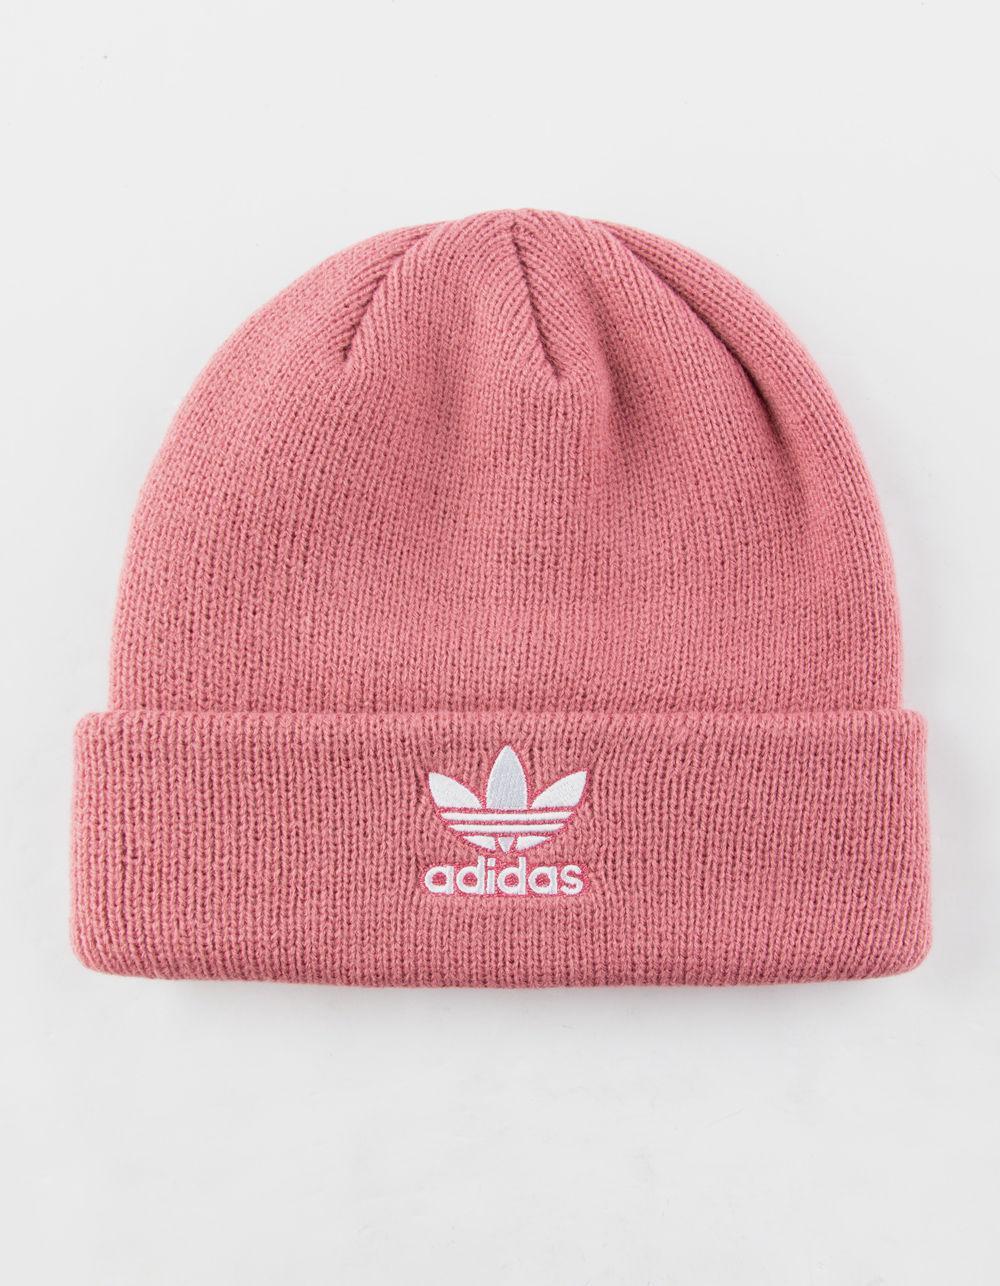 8be9a0c73302d ... Adidas - Originals Trefoil Pink Womens Beanie - Lyst. View fullscreen  adidas  Originals Trefoil II Knit ...